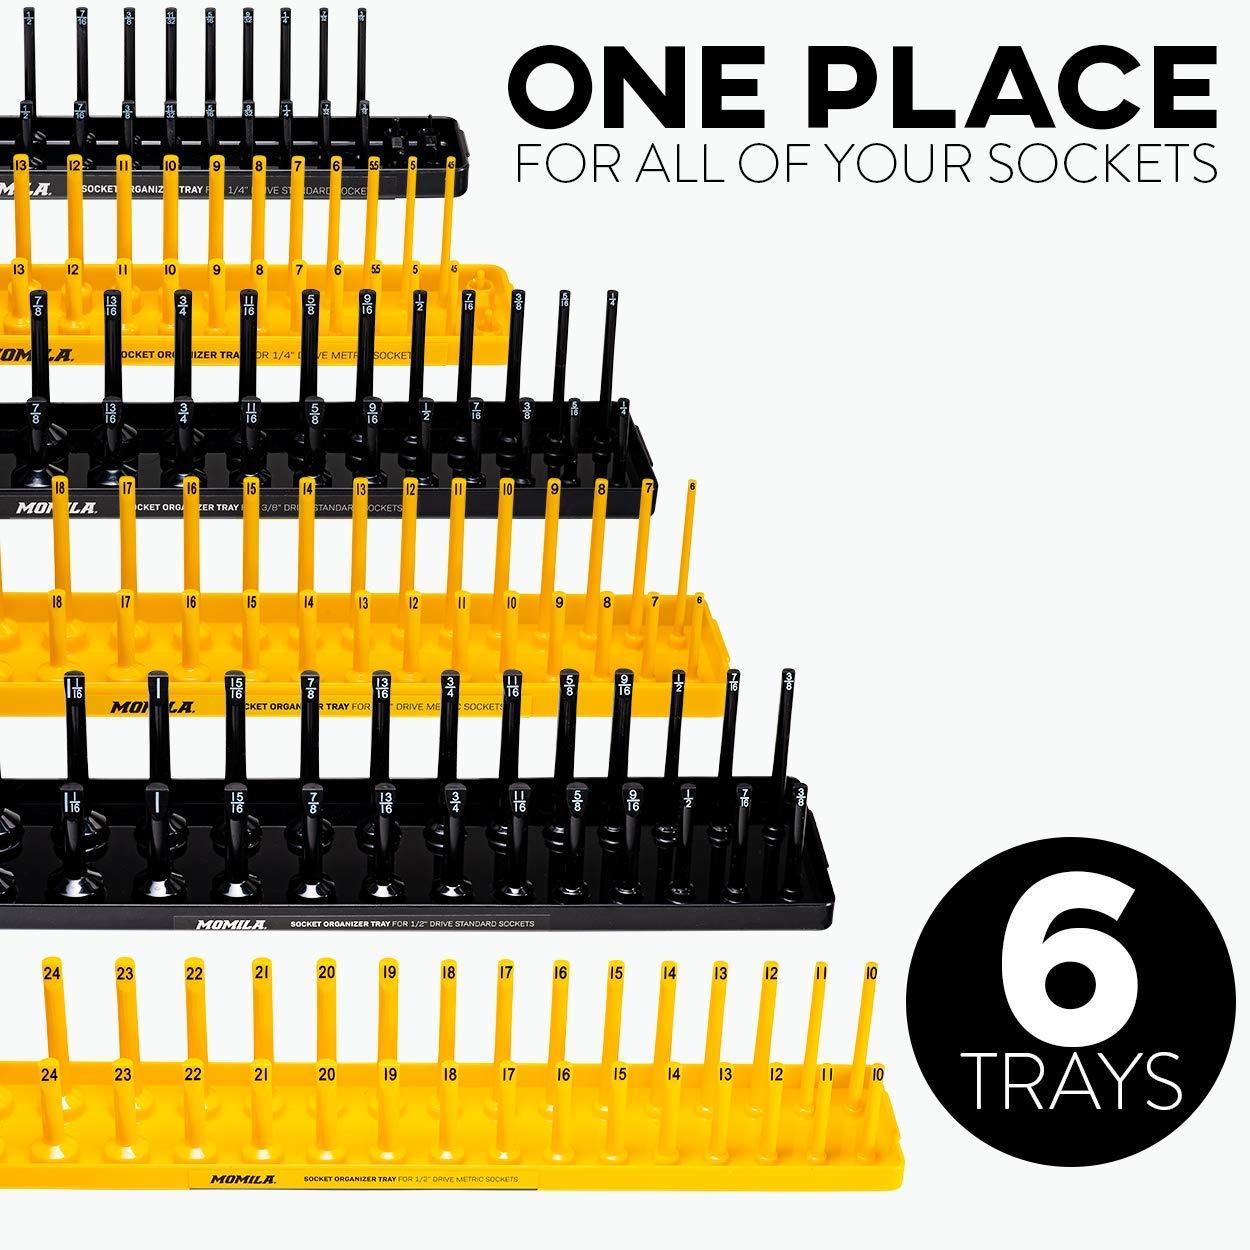 Socket Organizer Trays - 6 Piece Socket Tray Set Black SAE & Yellow Metric | 1/4-Inch, 3/8-Inch & 1/2-Inch Drive Socket Holder | Premium Quality Tool Organizers by Momila (Image #2)